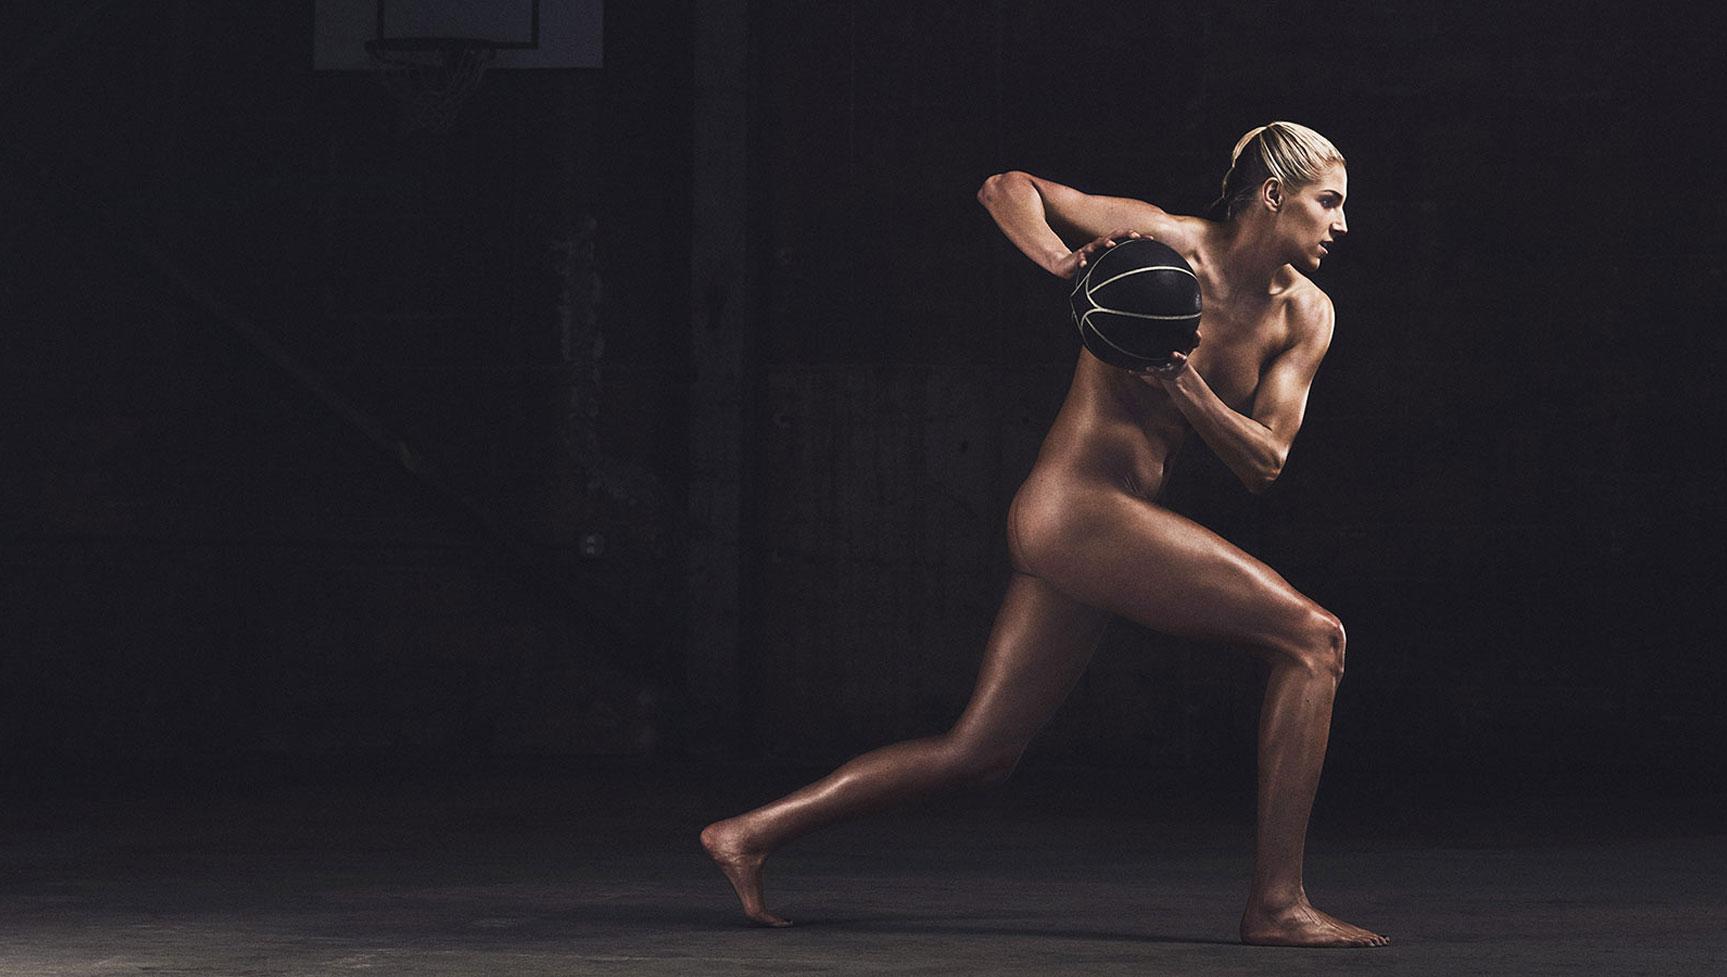 ESPN Magazine The Body Issue 2016 - Elena Delle Donne / Елена Делле Донн - Культ тела журнала ESPN